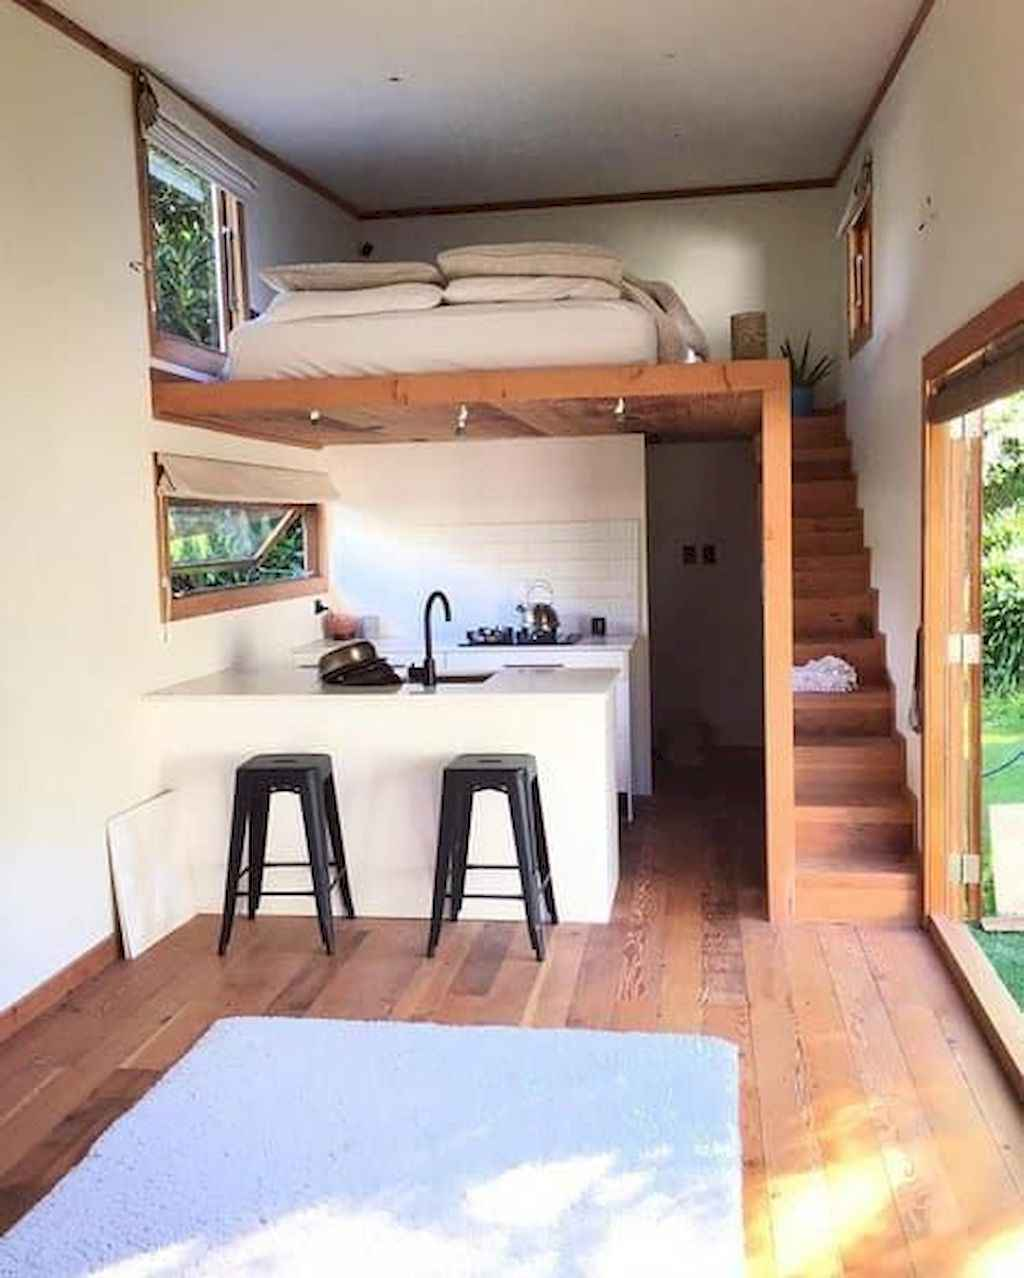 17 Tiny House Kitchen Storage Organization and Tips Ideas